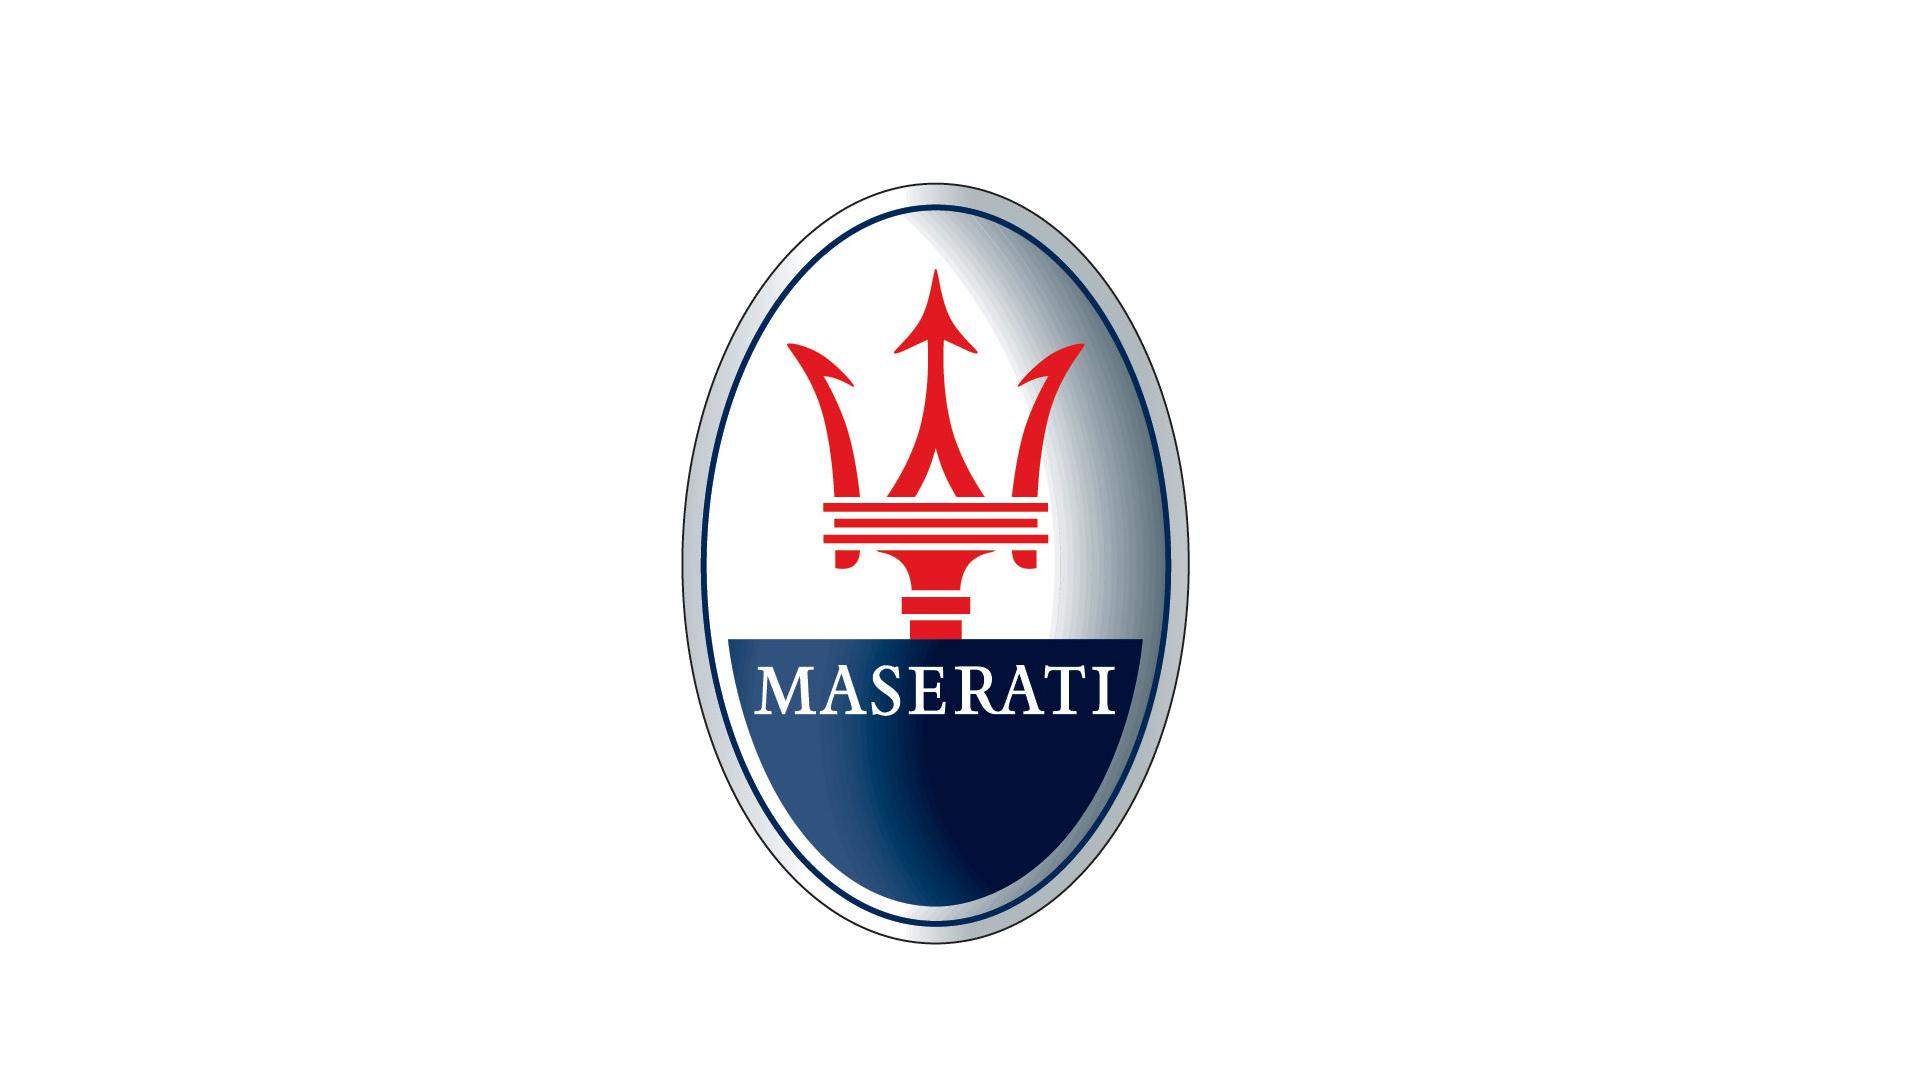 Maserati Symbol 1920x1080 (HD 1080p Png) - Carlogo HD PNG